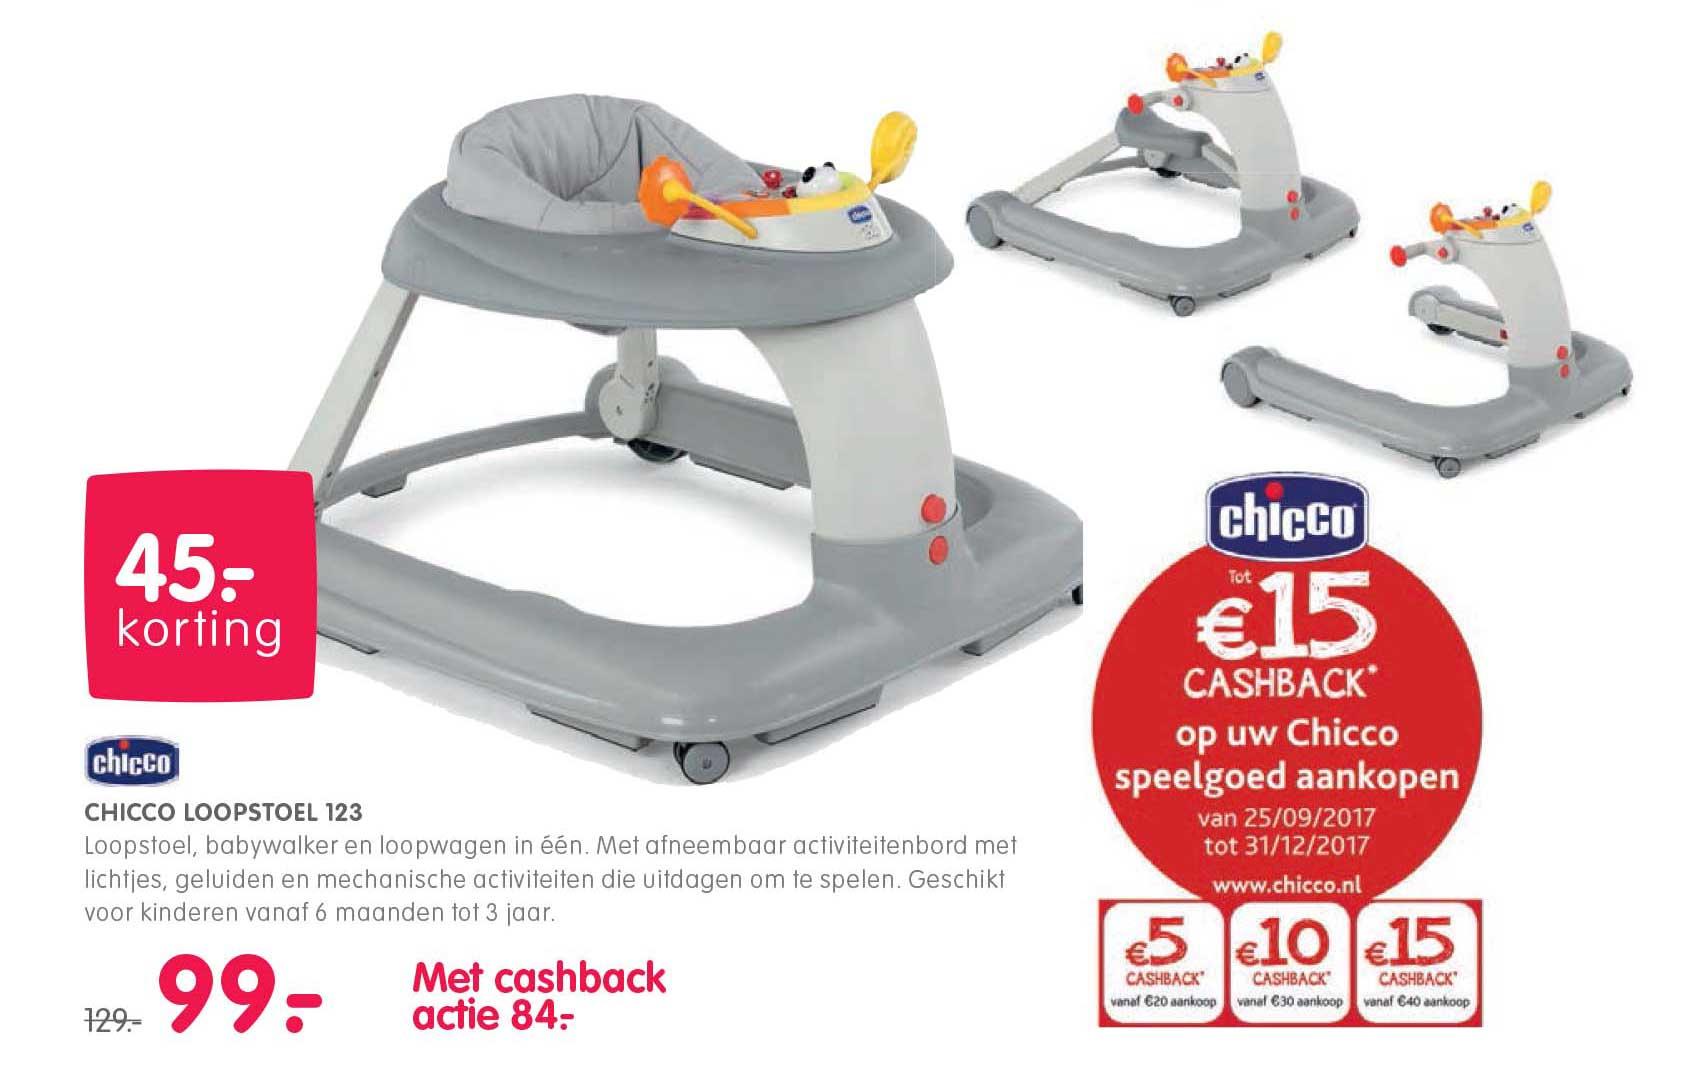 Prénatal Chicco Loopstoel 123: €45,- Korting